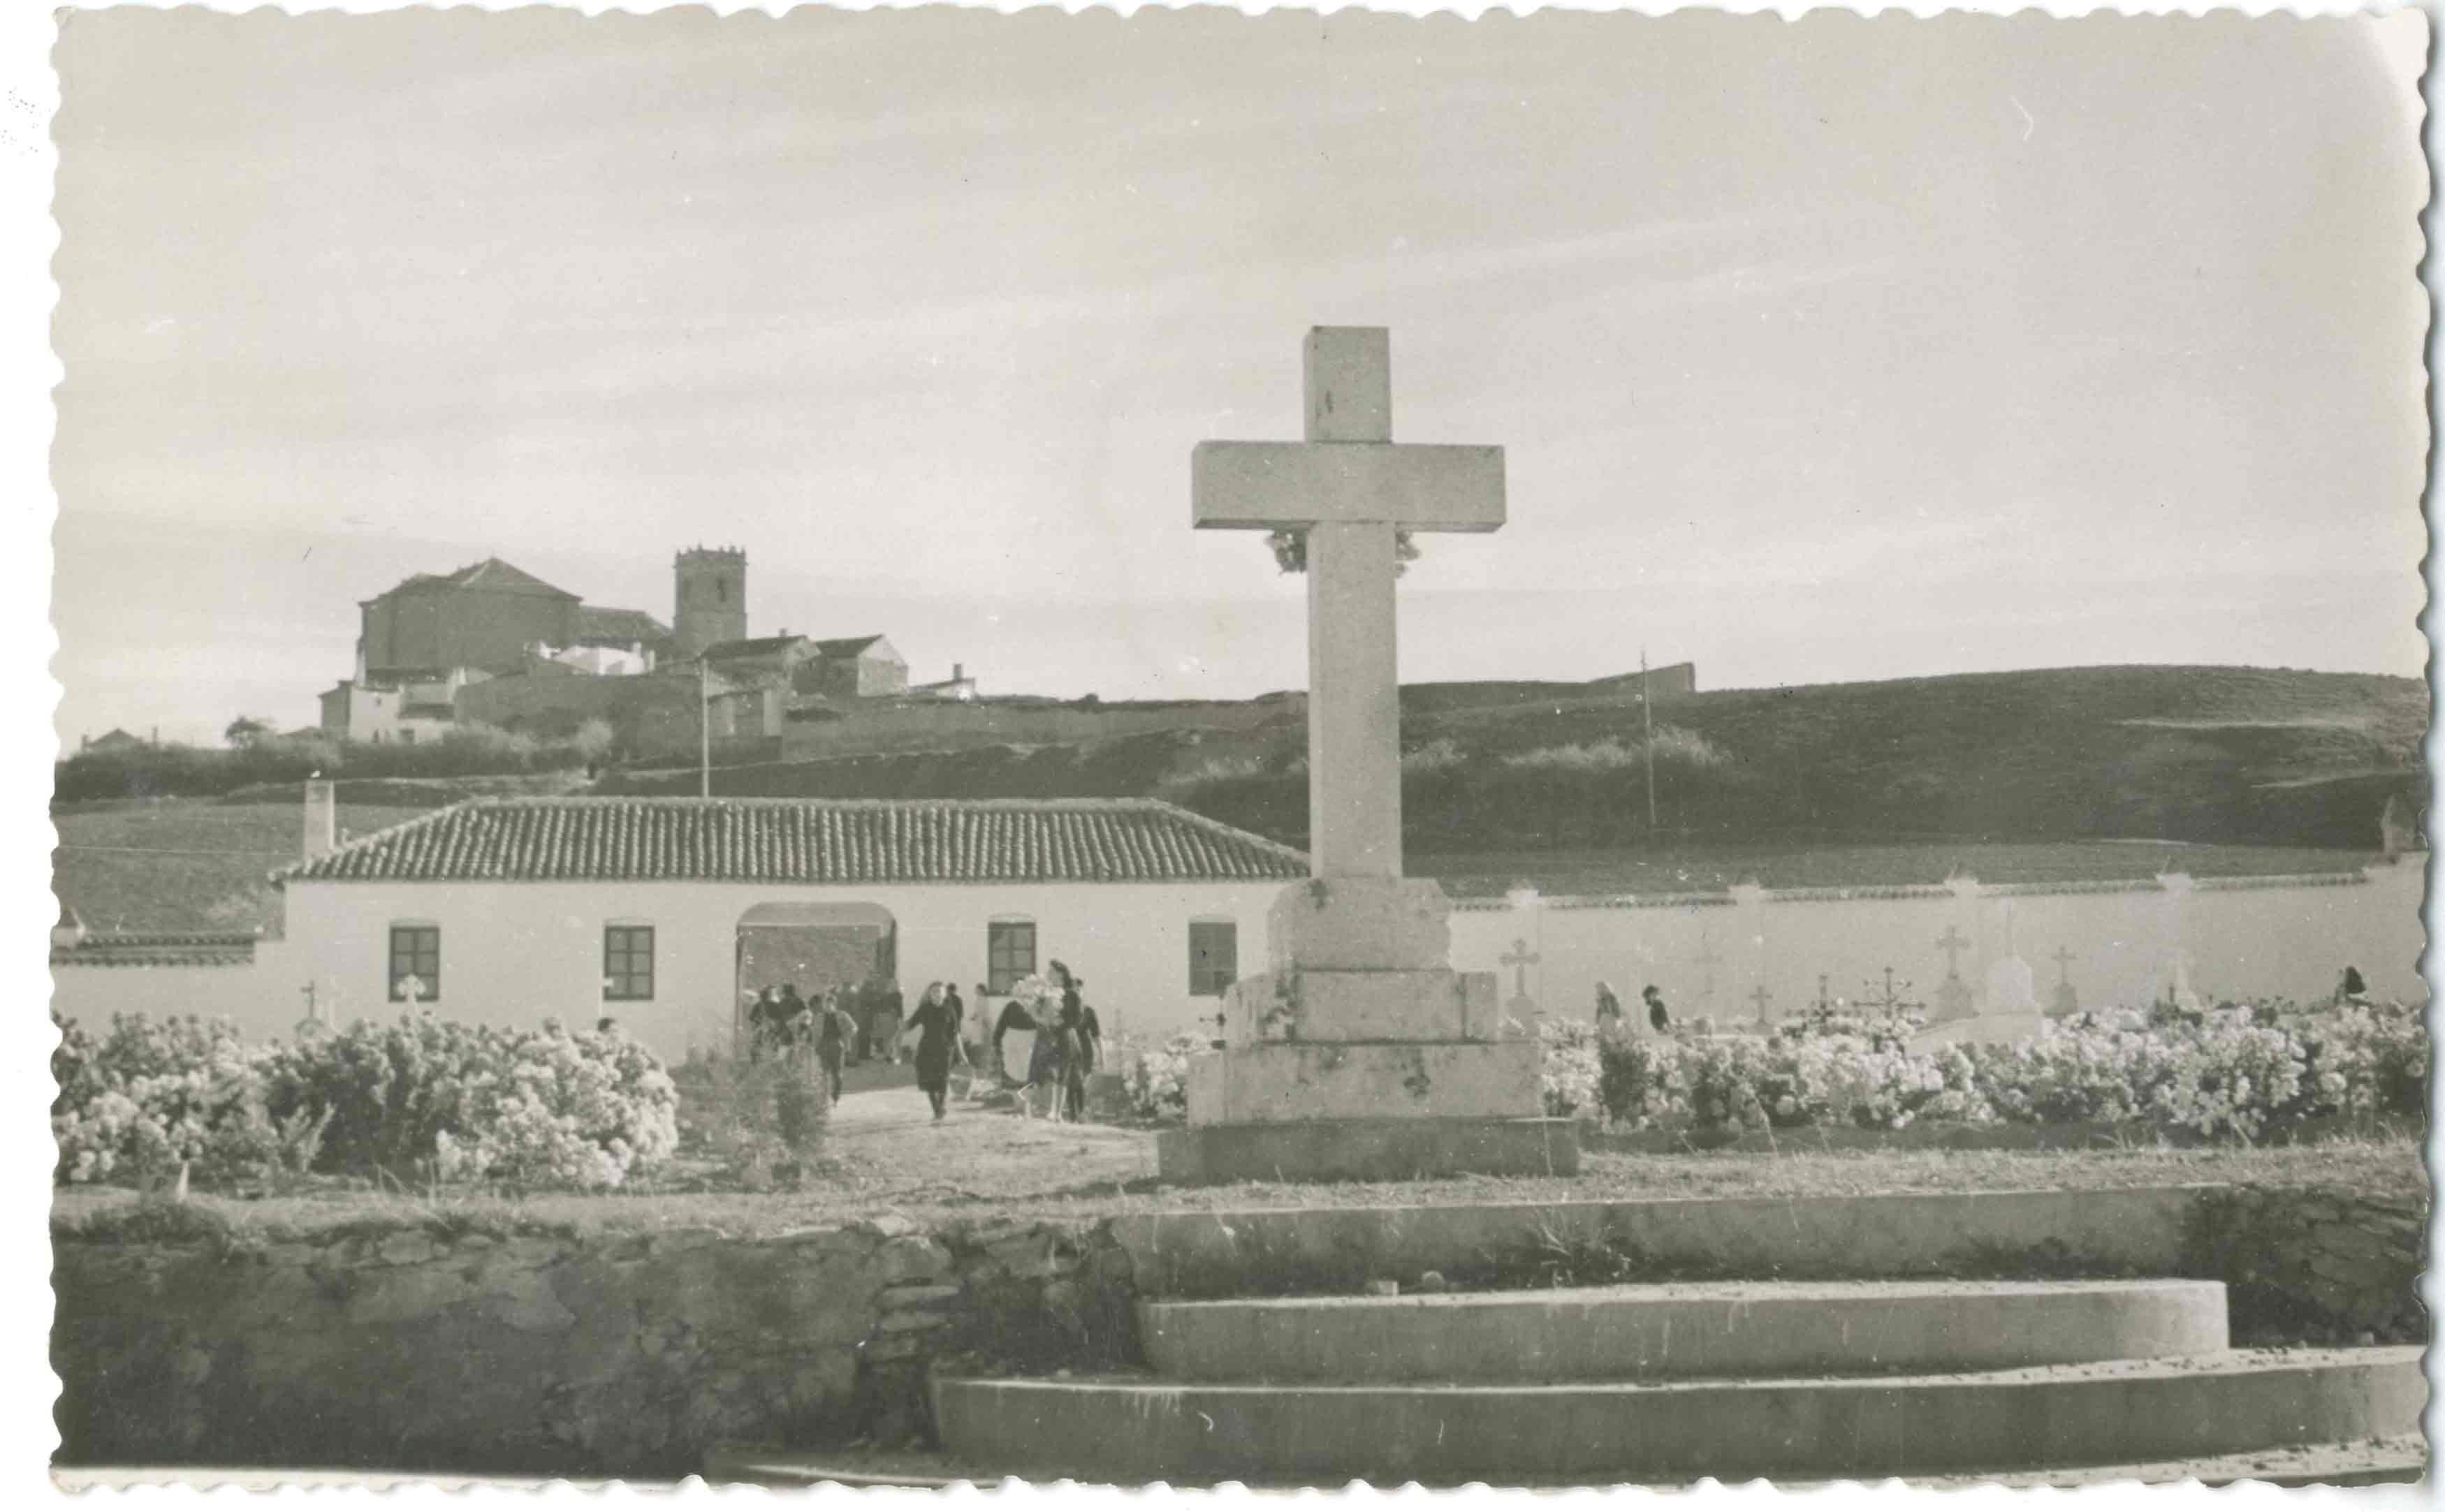 Santa Cruz de la Zarza. Cementerio. 1960 (P-813)